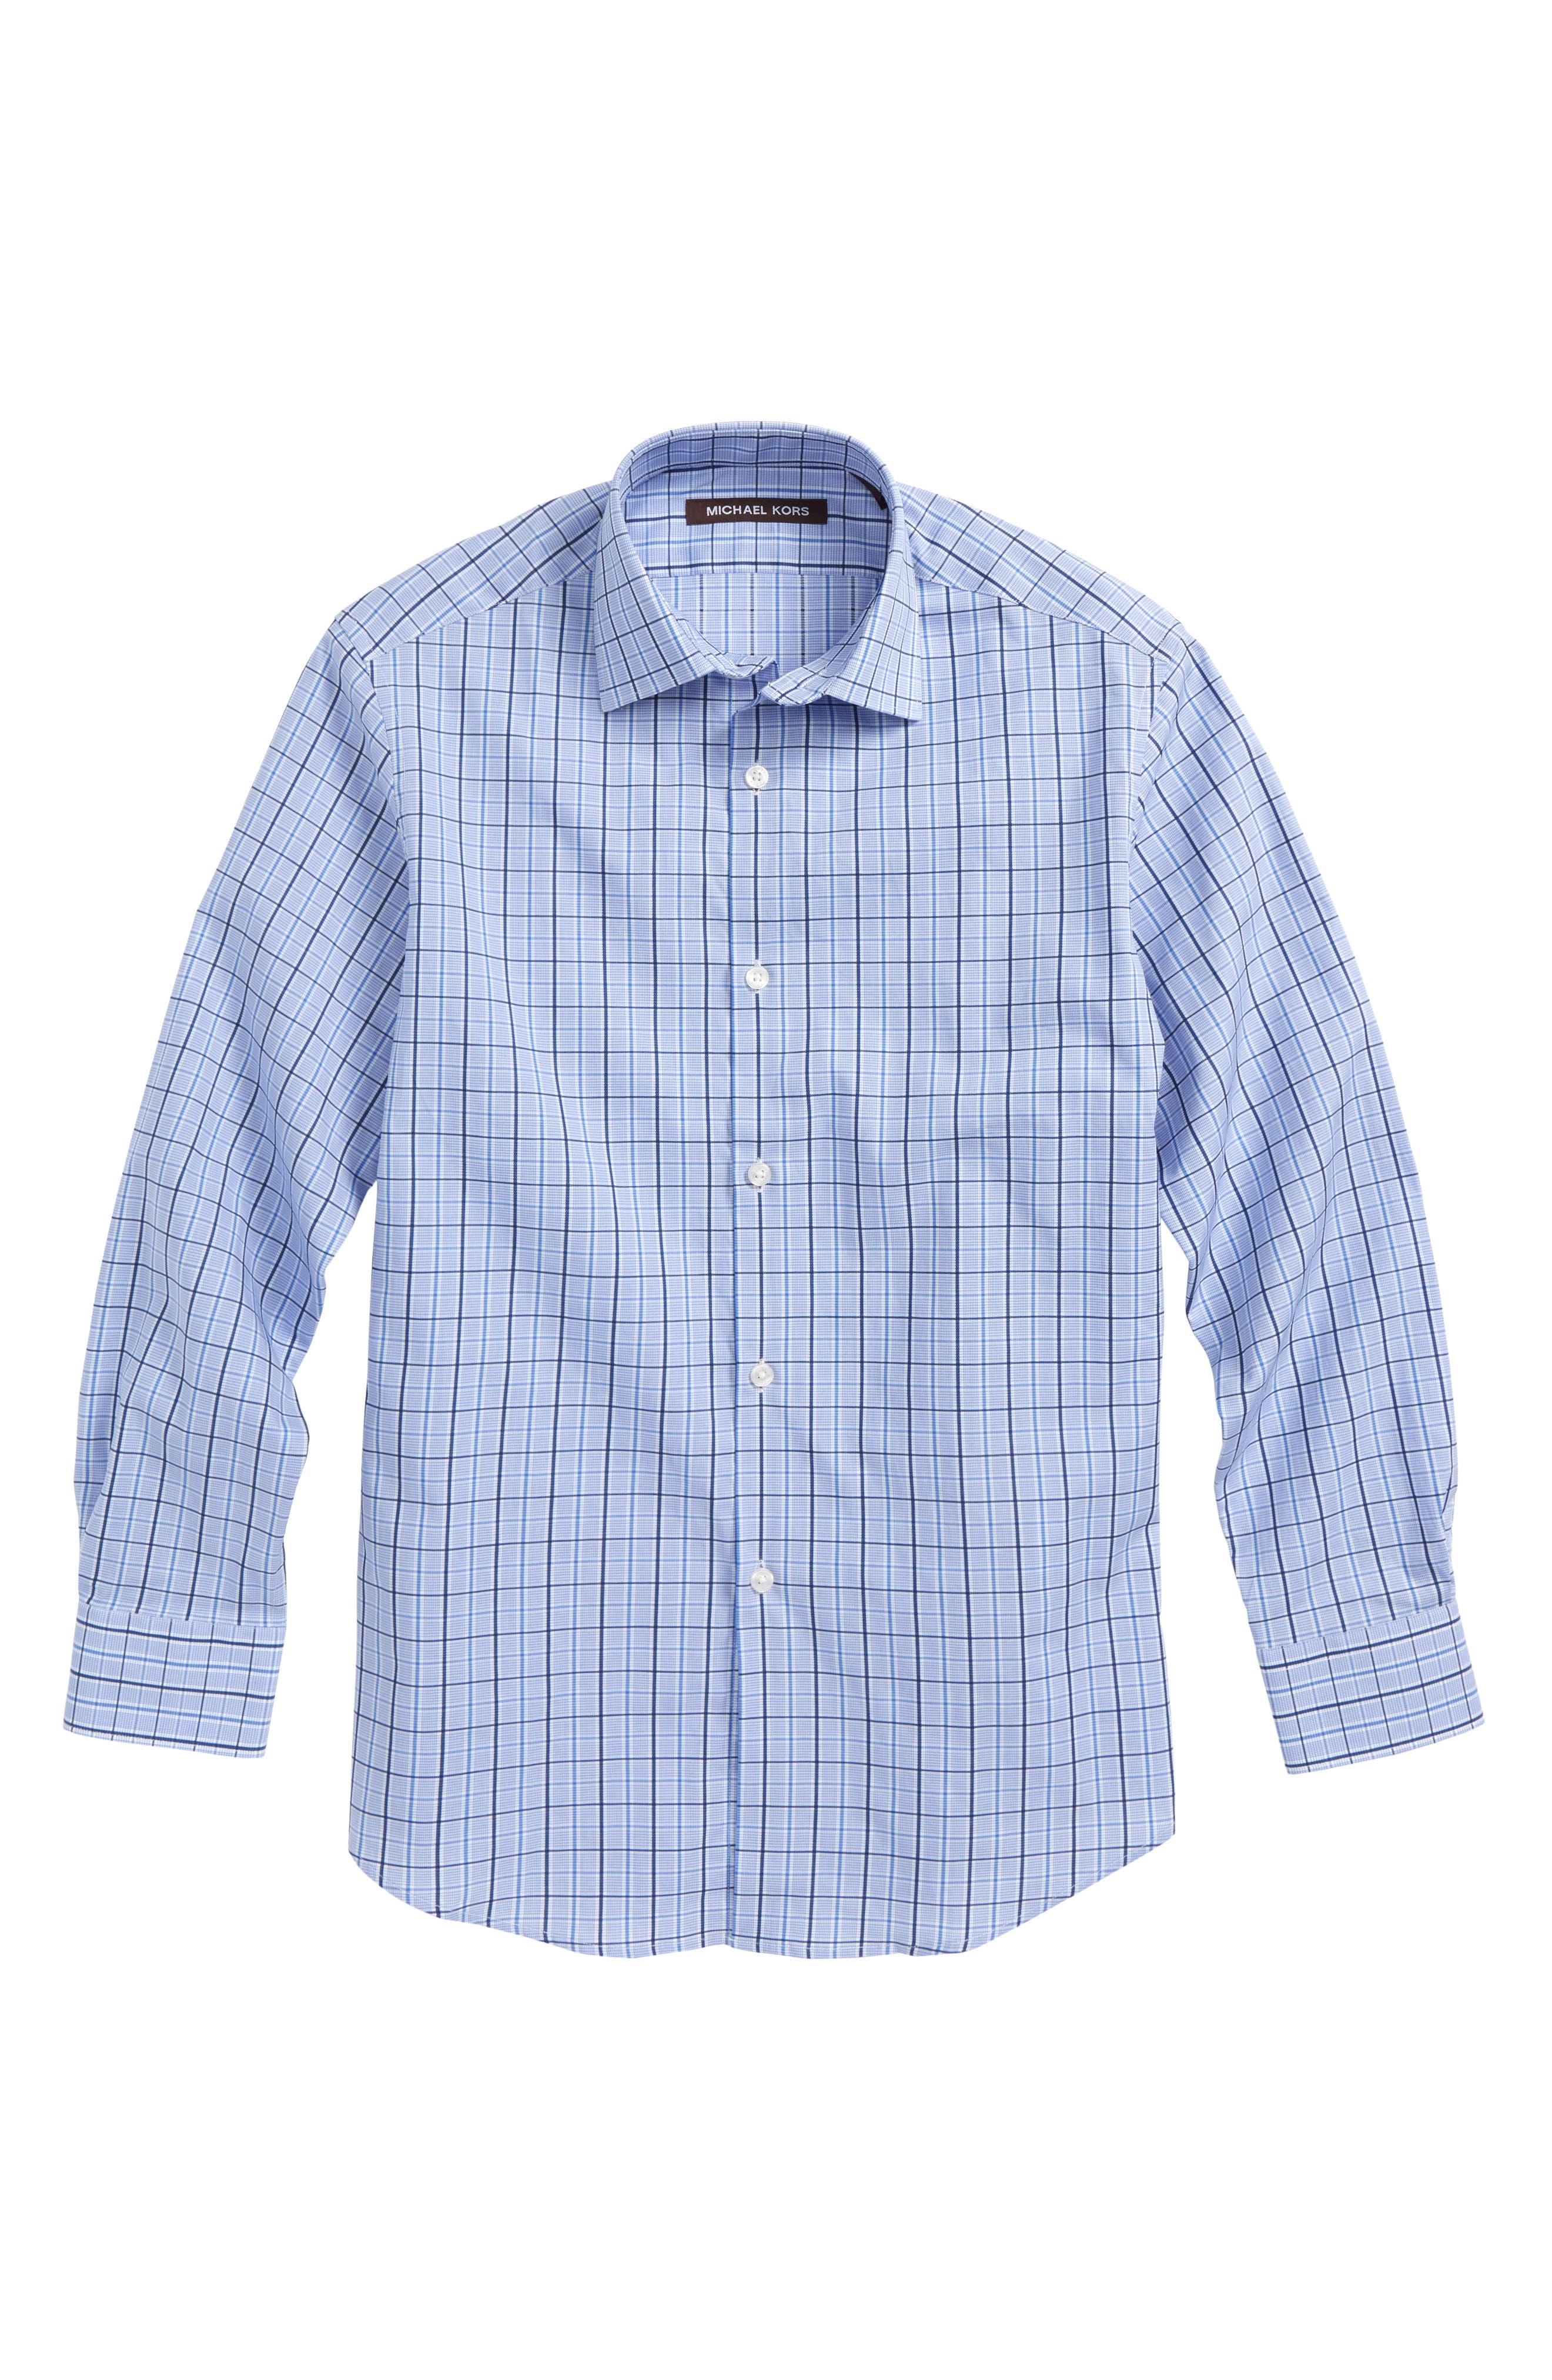 Plaid Dress Shirt,                             Main thumbnail 1, color,                             Blue/ White